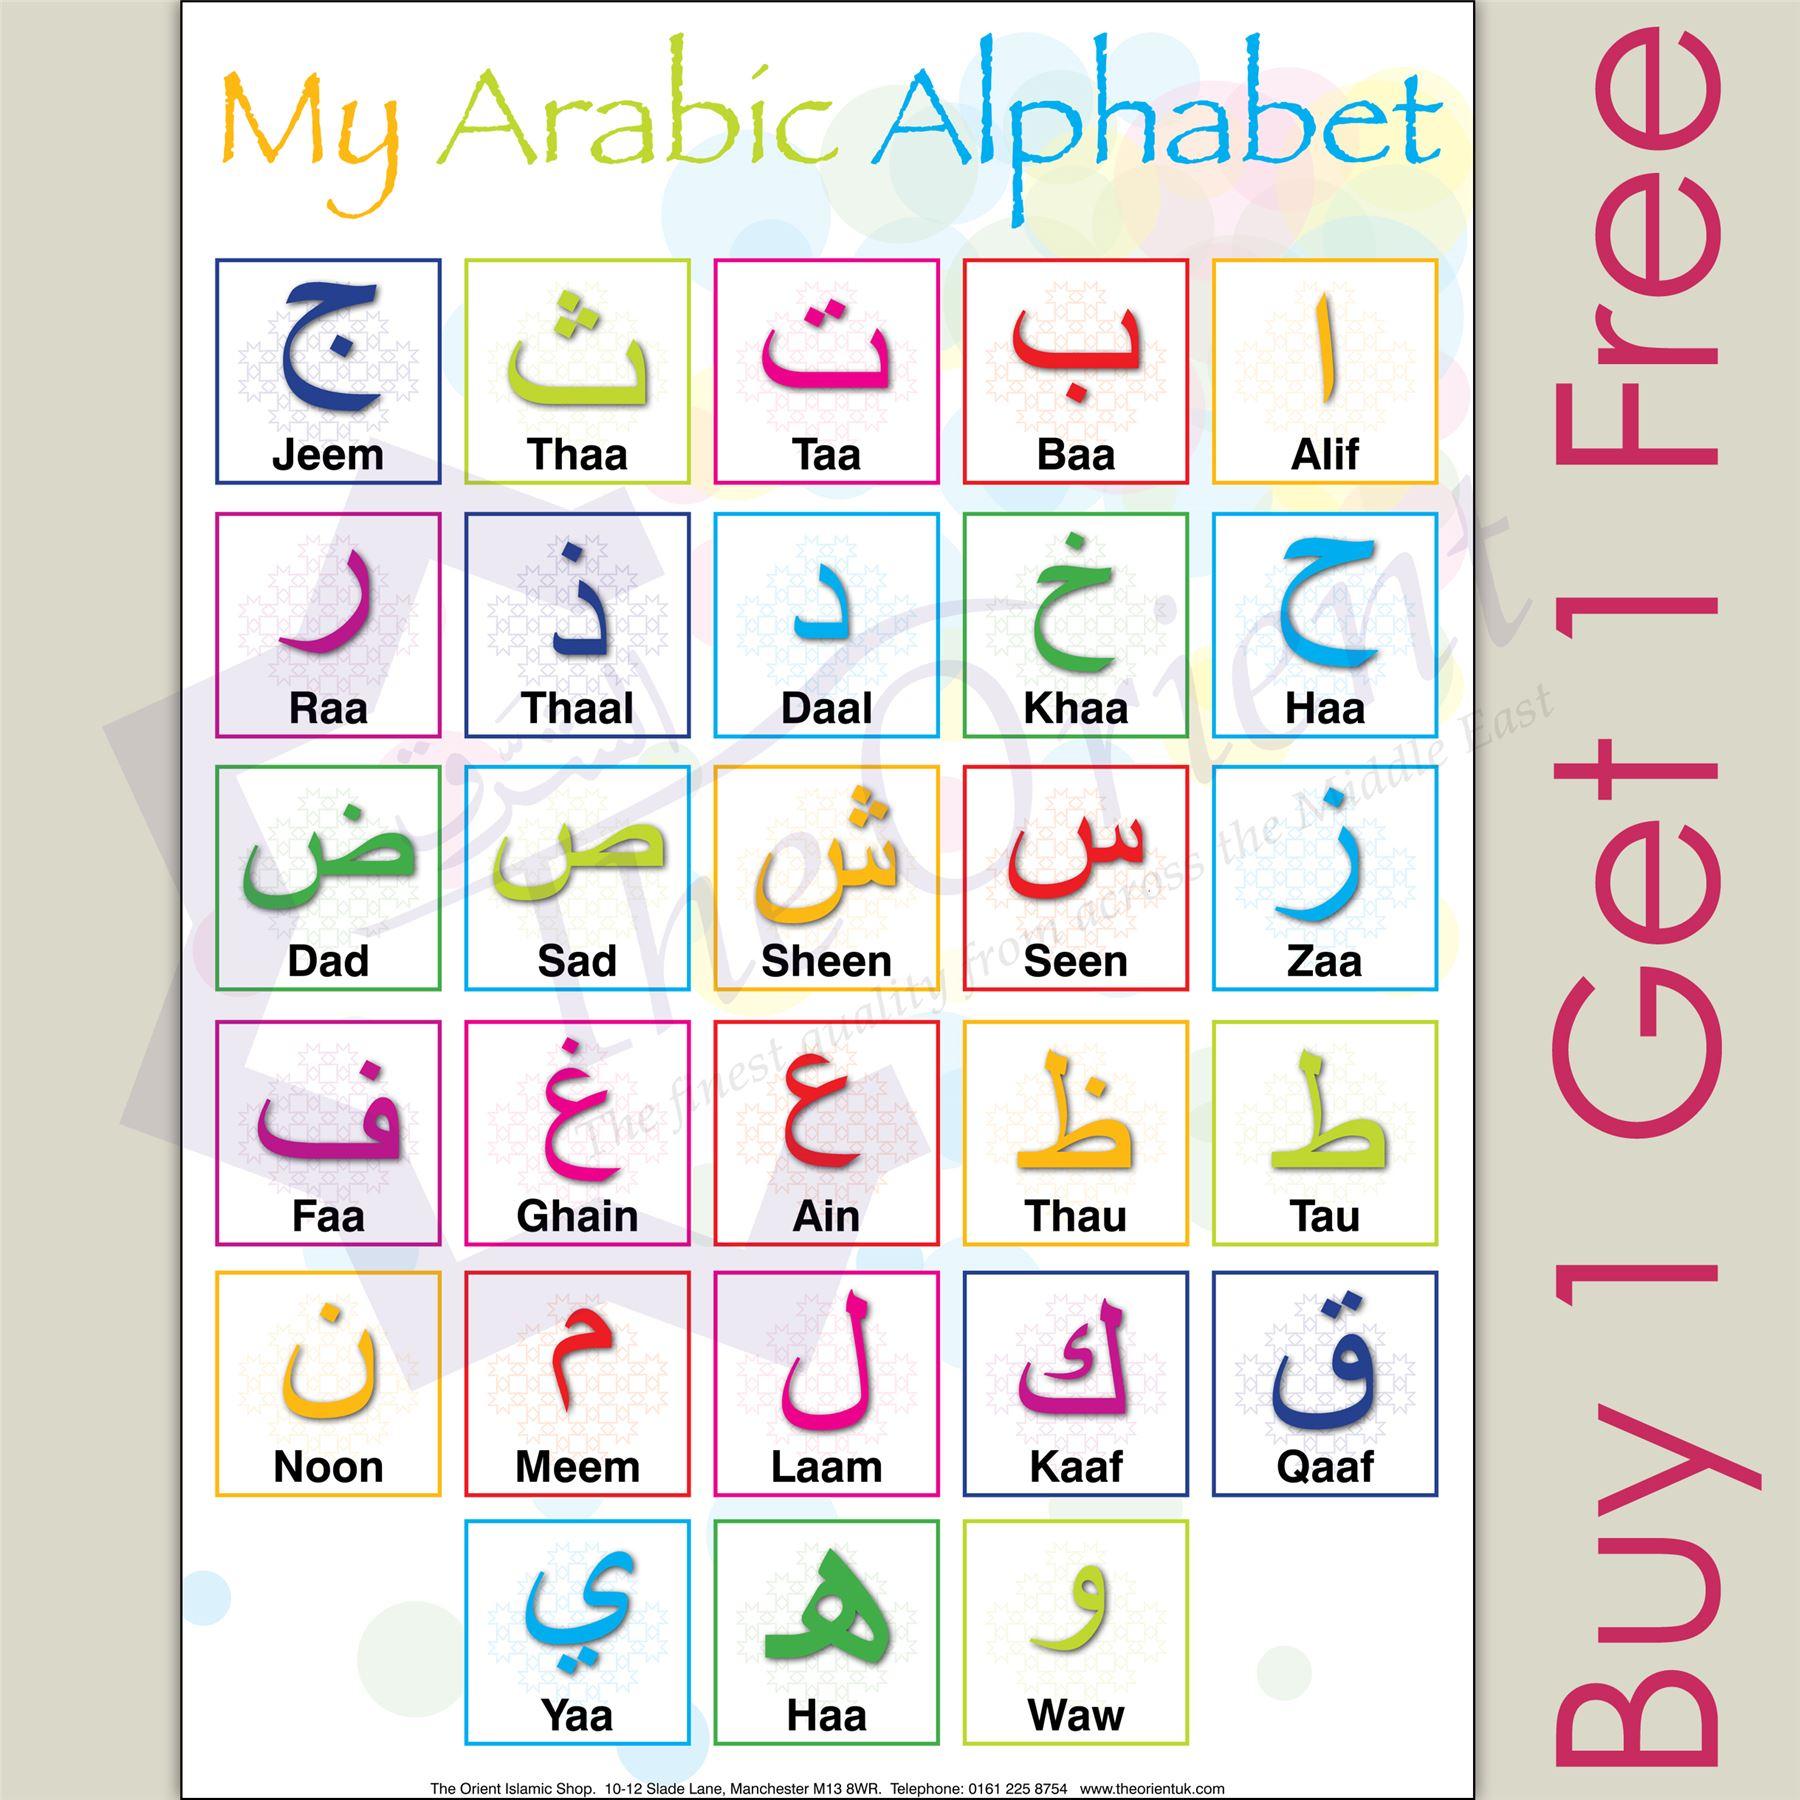 My Arabic Alphabet A3 Learning Poster Teaching Arabic